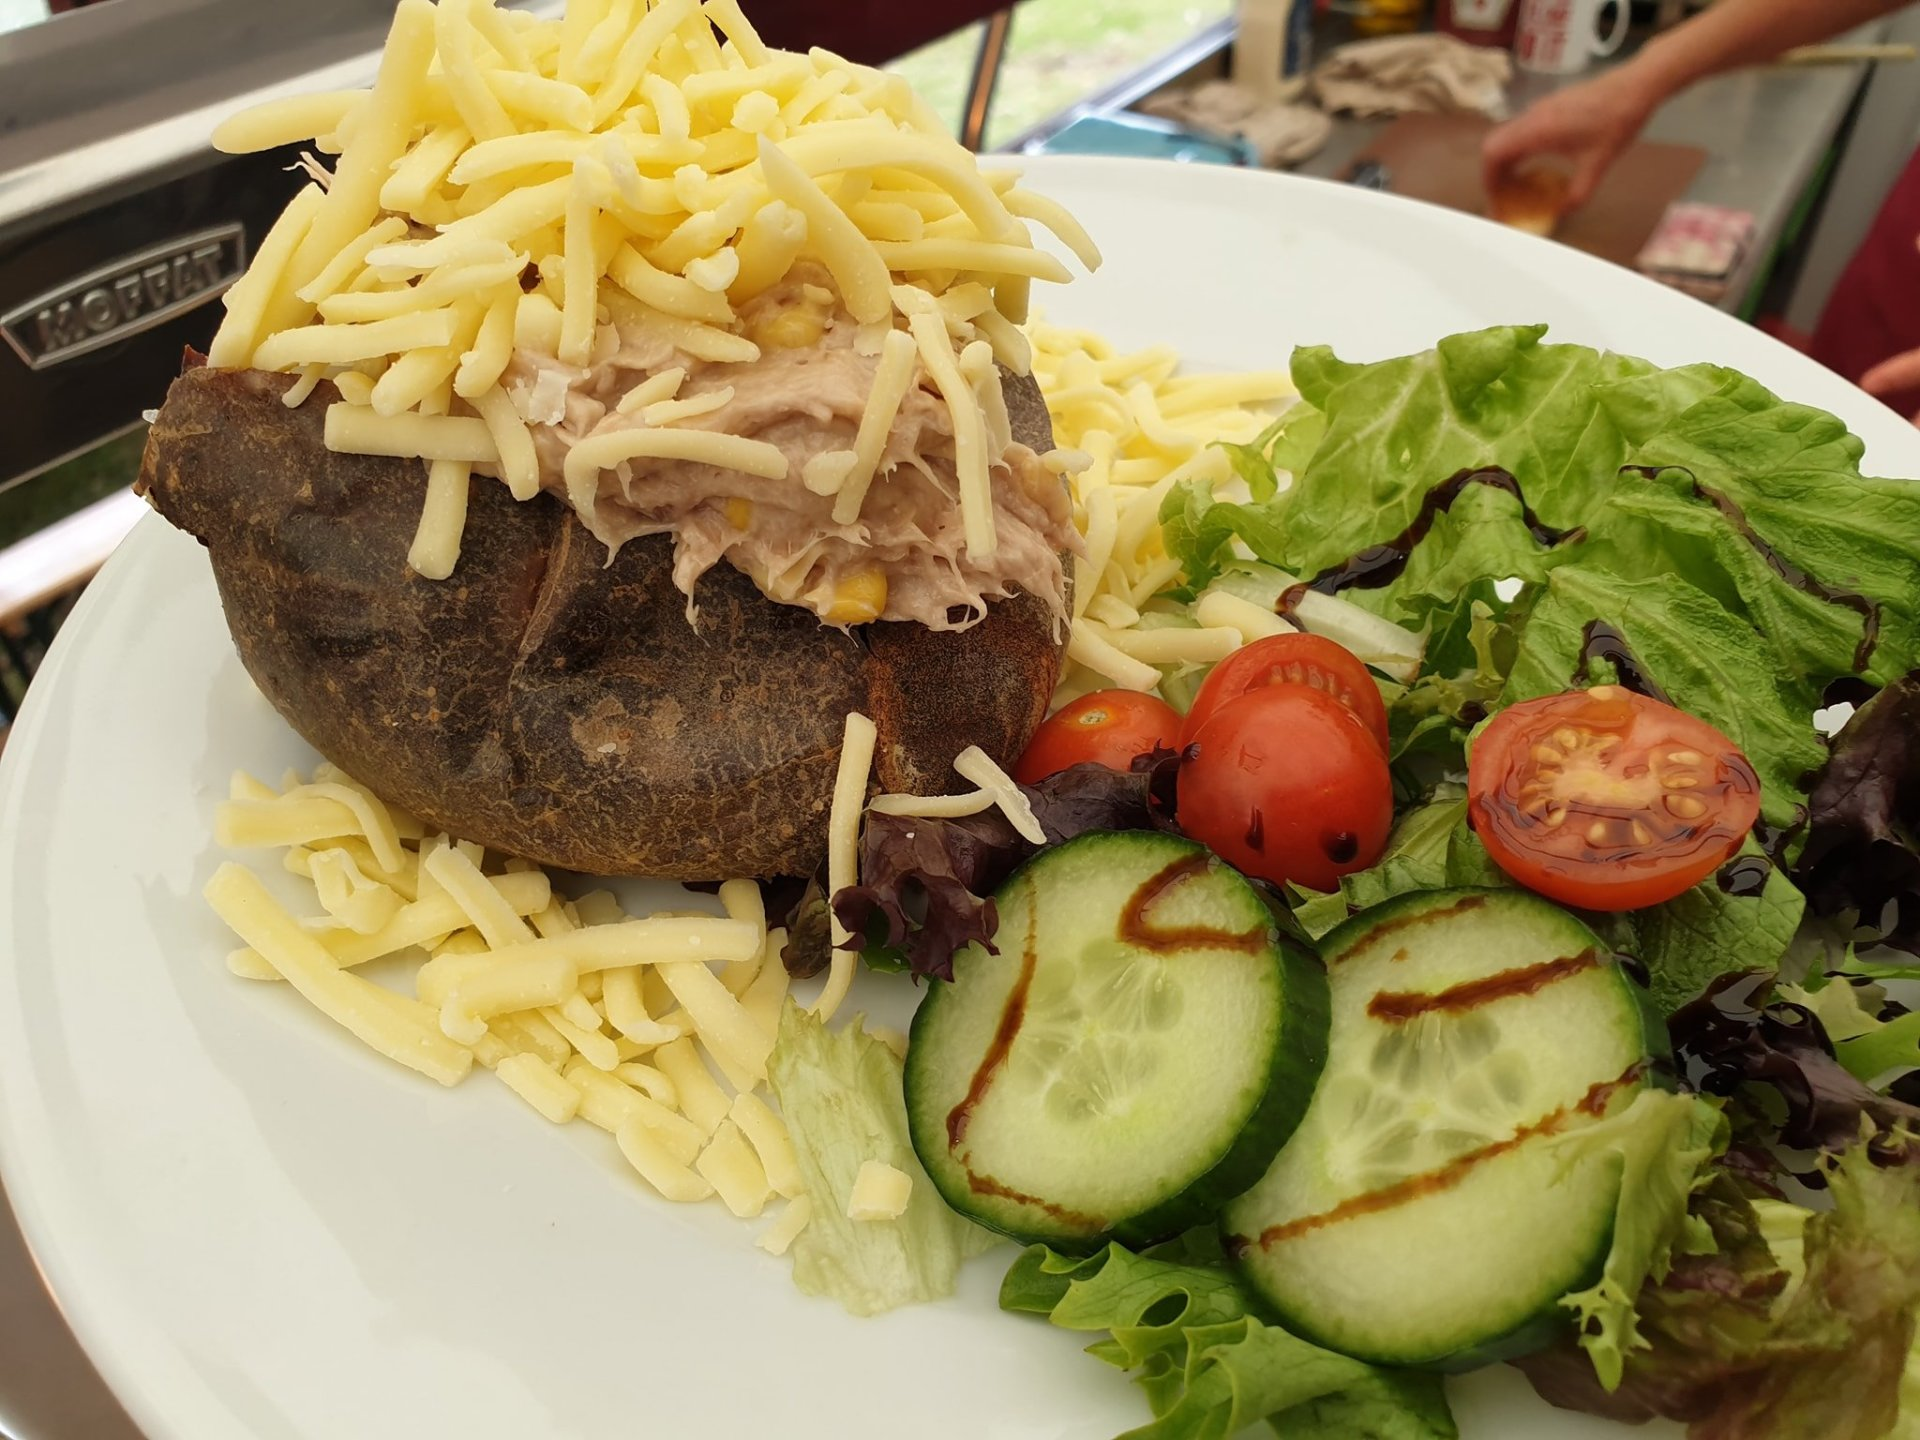 Oven Baked Jacket Potato